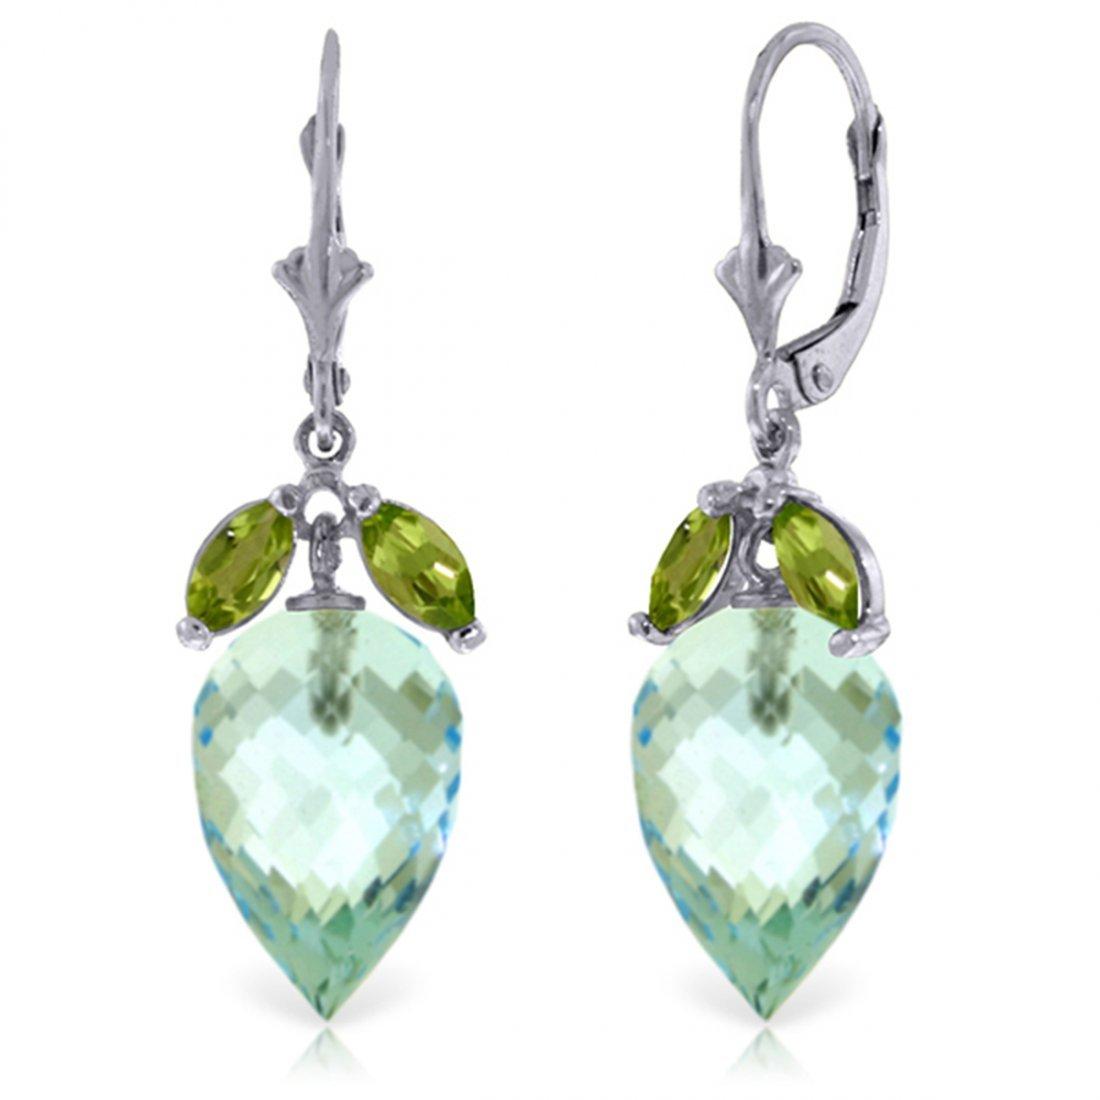 14k White Gold 22.50ct Blue Topaz & Peridot Earrings